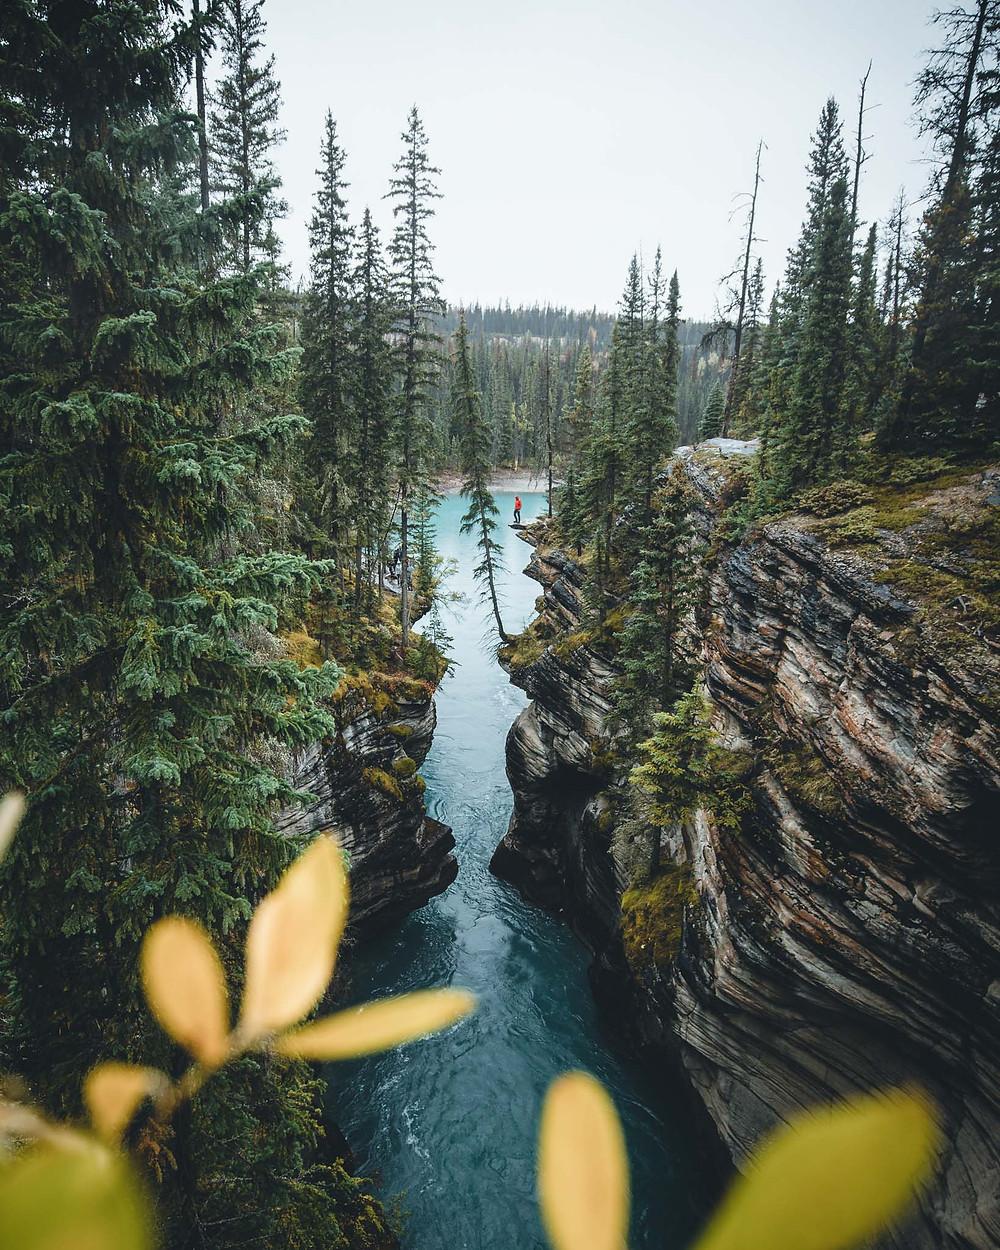 Athabasca Falls, Abenteuer, Blog, Instagram, Canada, Kanada, Route, Photography, Fotografie, Reisen, Jasper